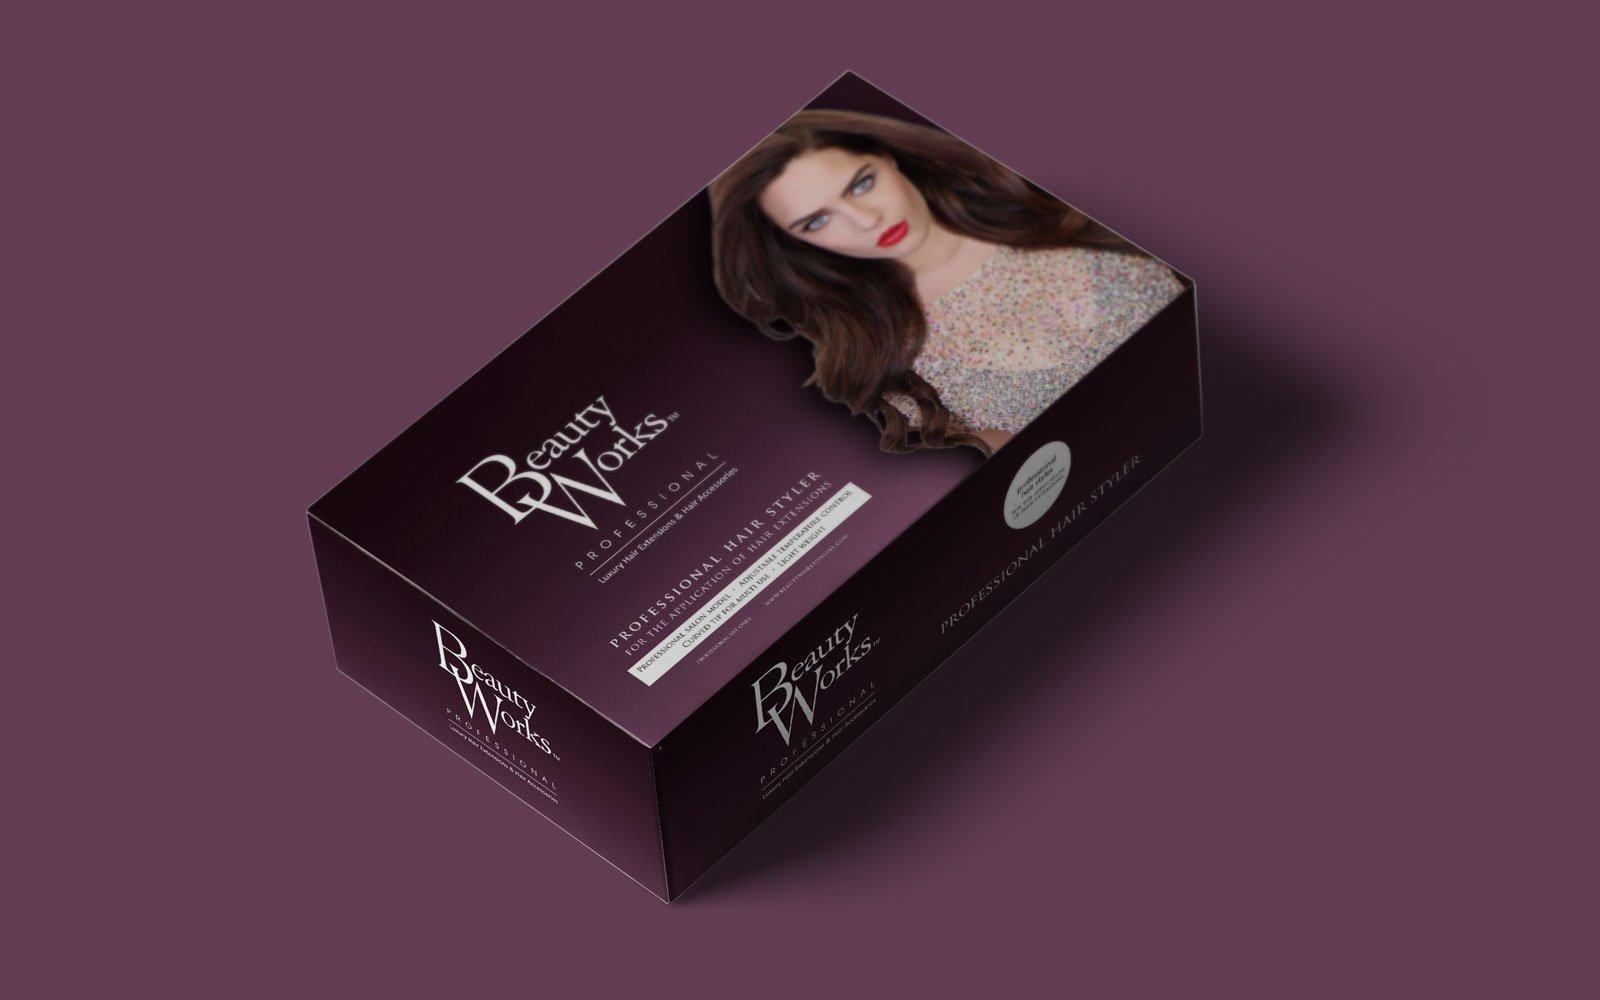 packaging design for hair straighteners